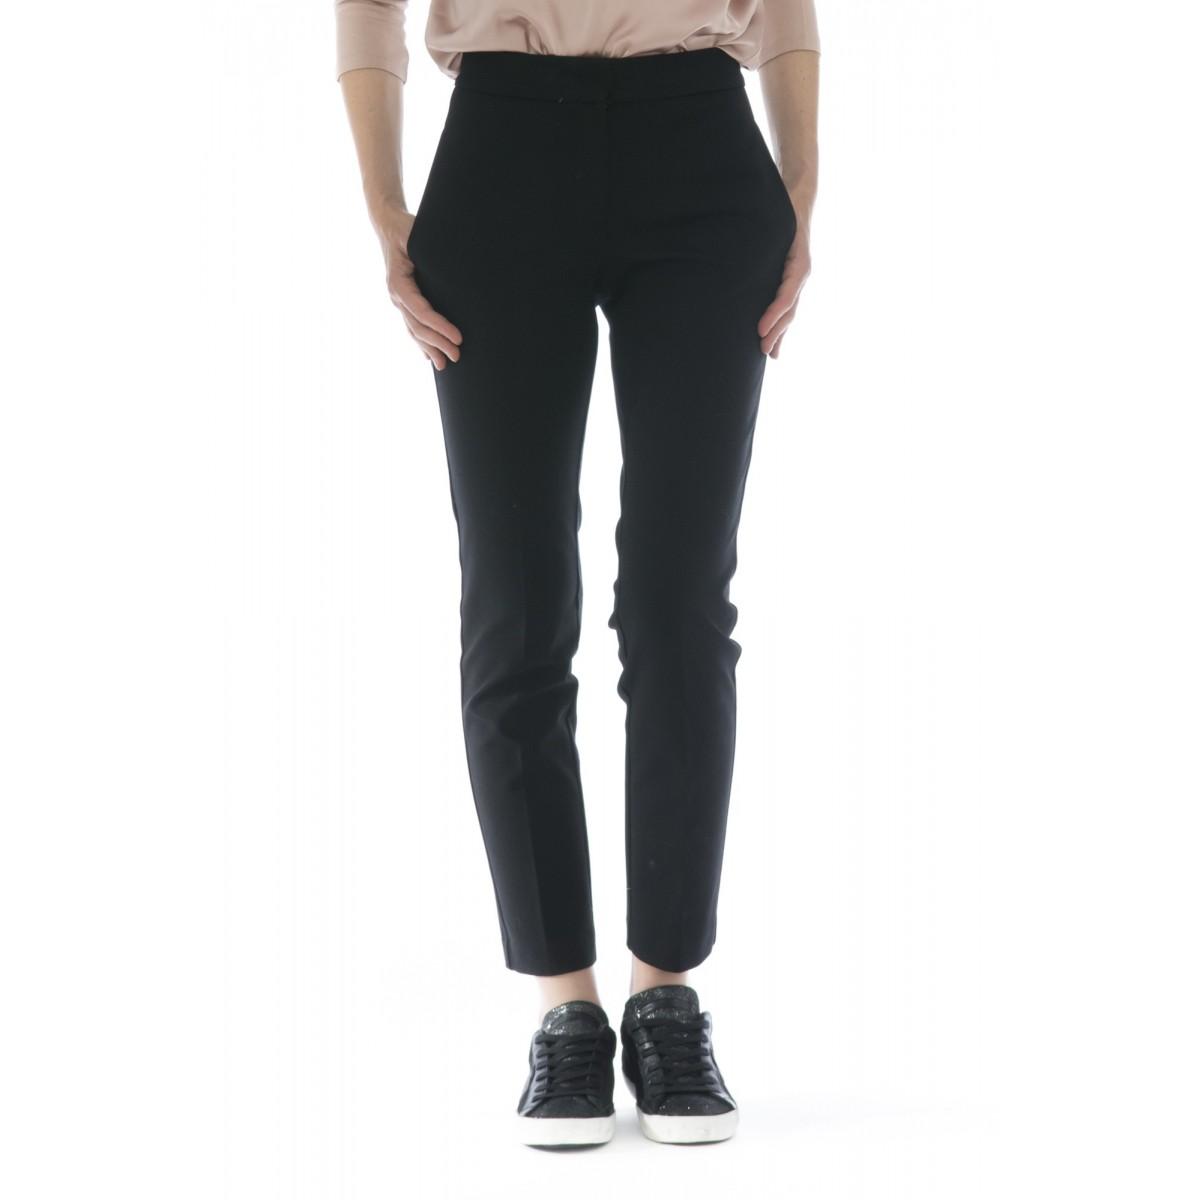 Pantalone donna - J4107 pantalone sigaretta punto milano